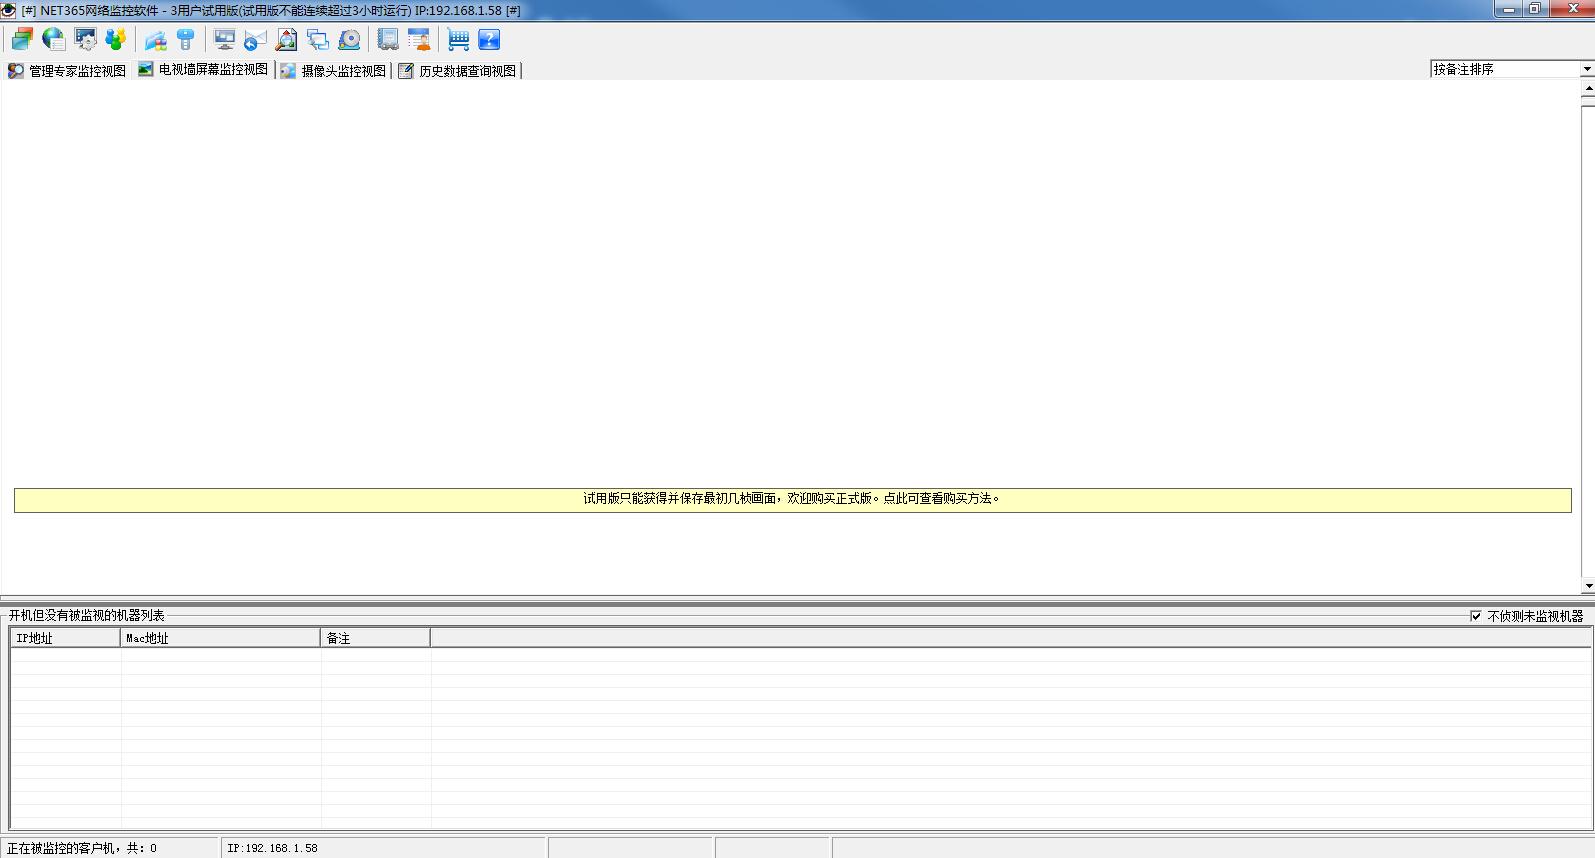 NET365网络监控软件截图4